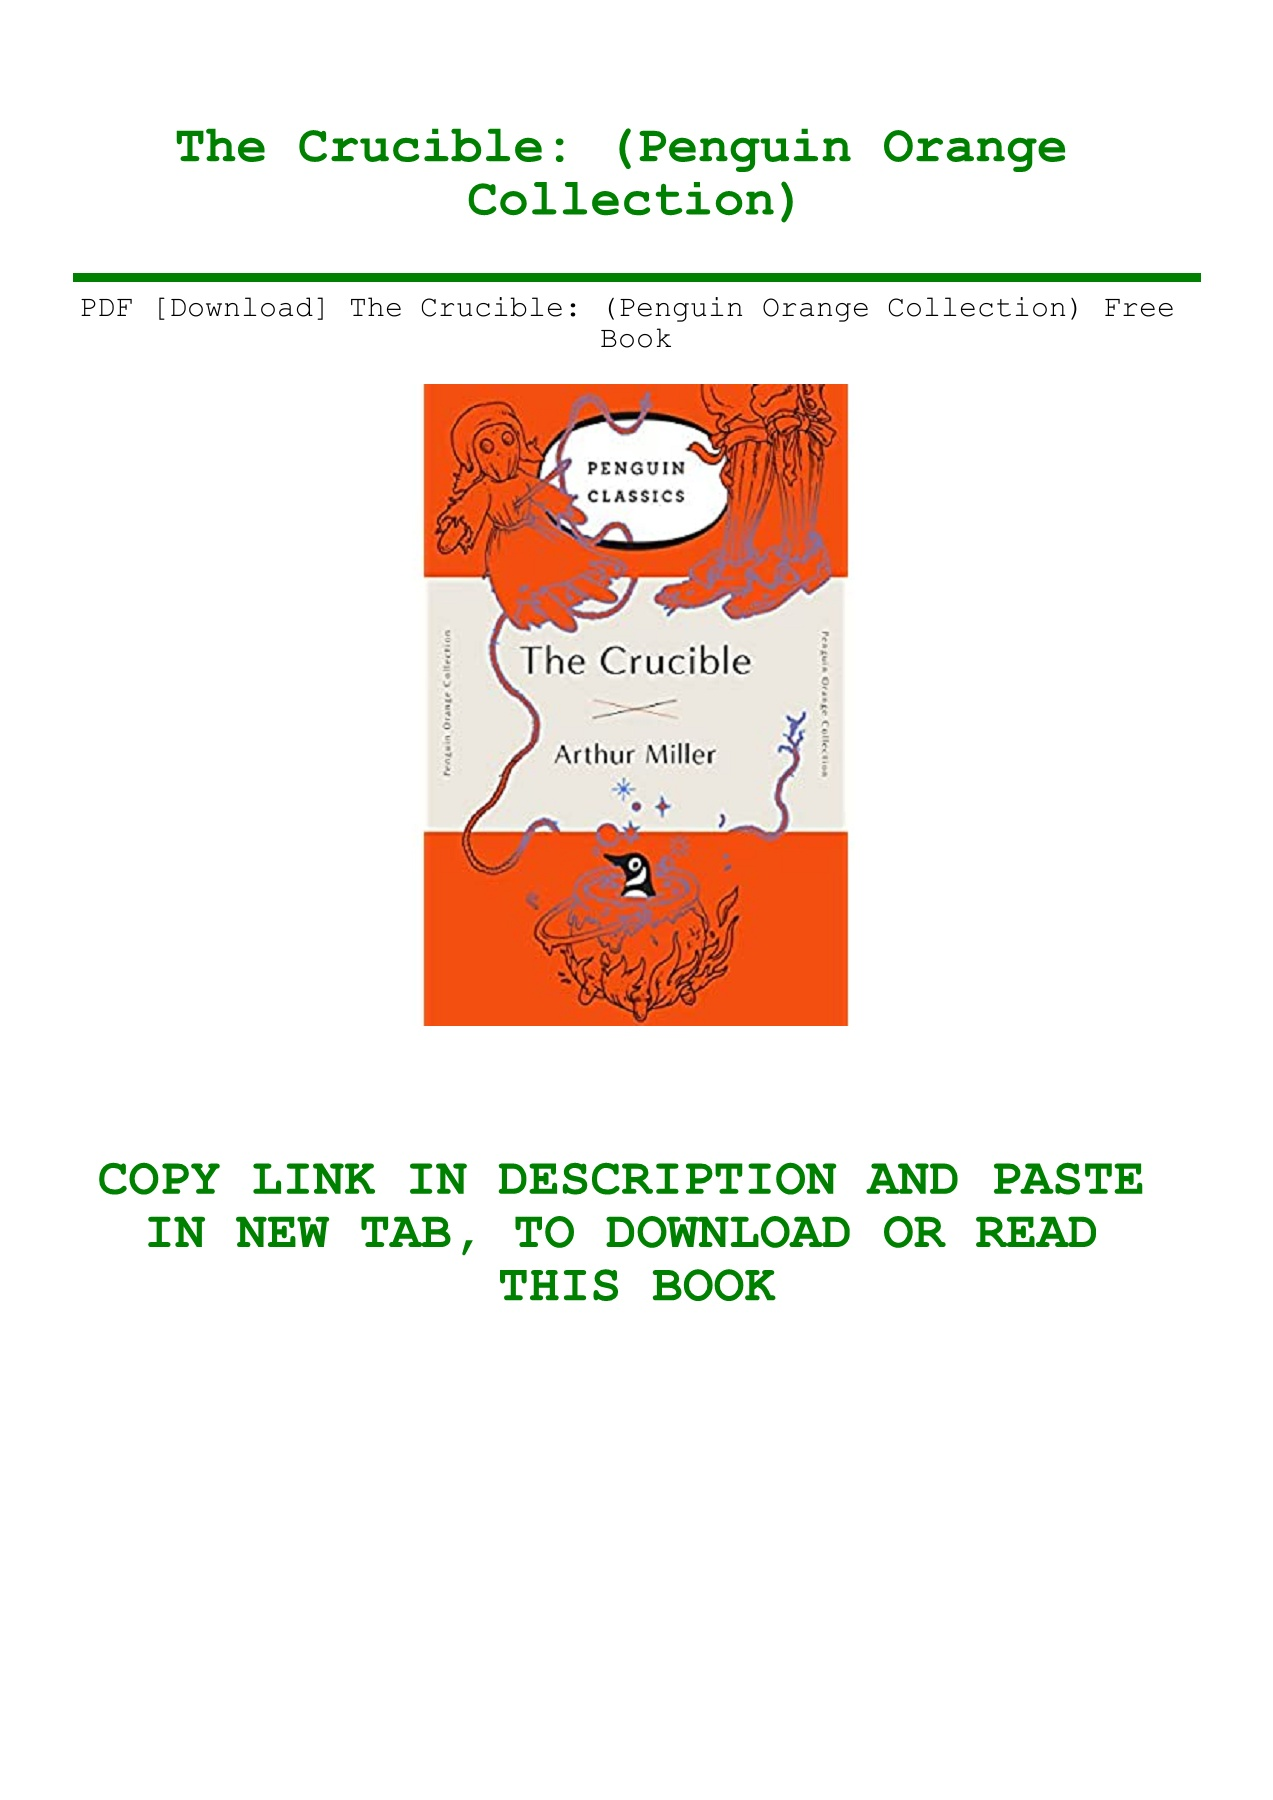 The Crucible Free Pdf Download